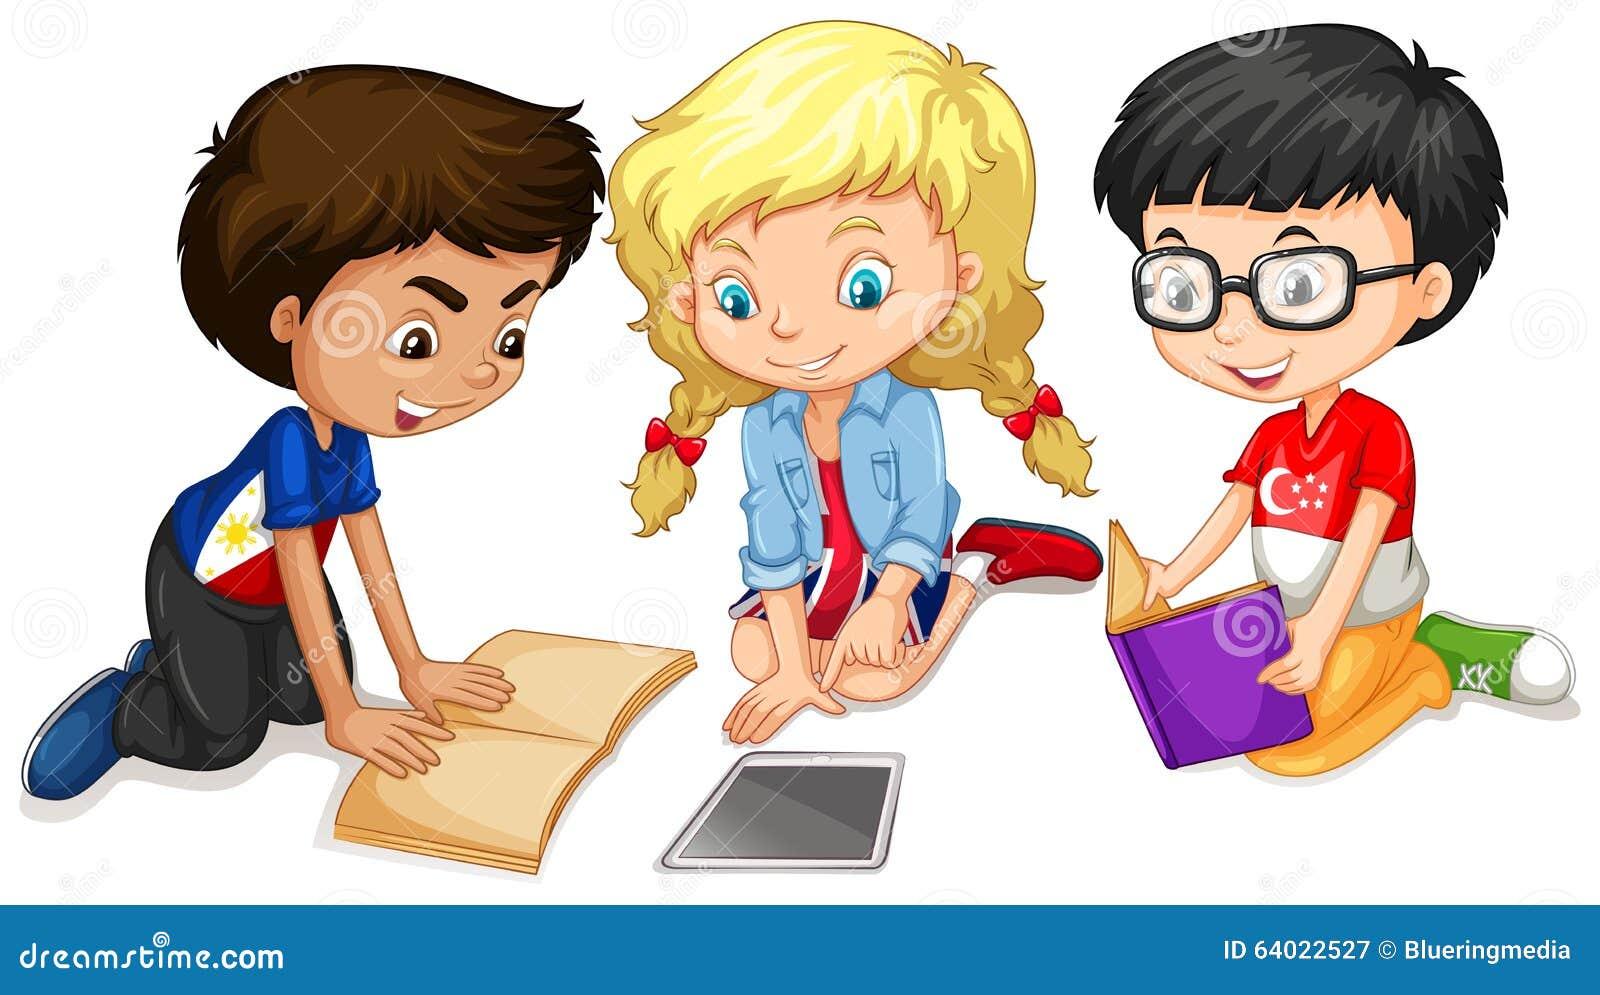 Children Reading Stock Vector Art More Images Of Baby: Children Reading And Doing Work Stock Vector